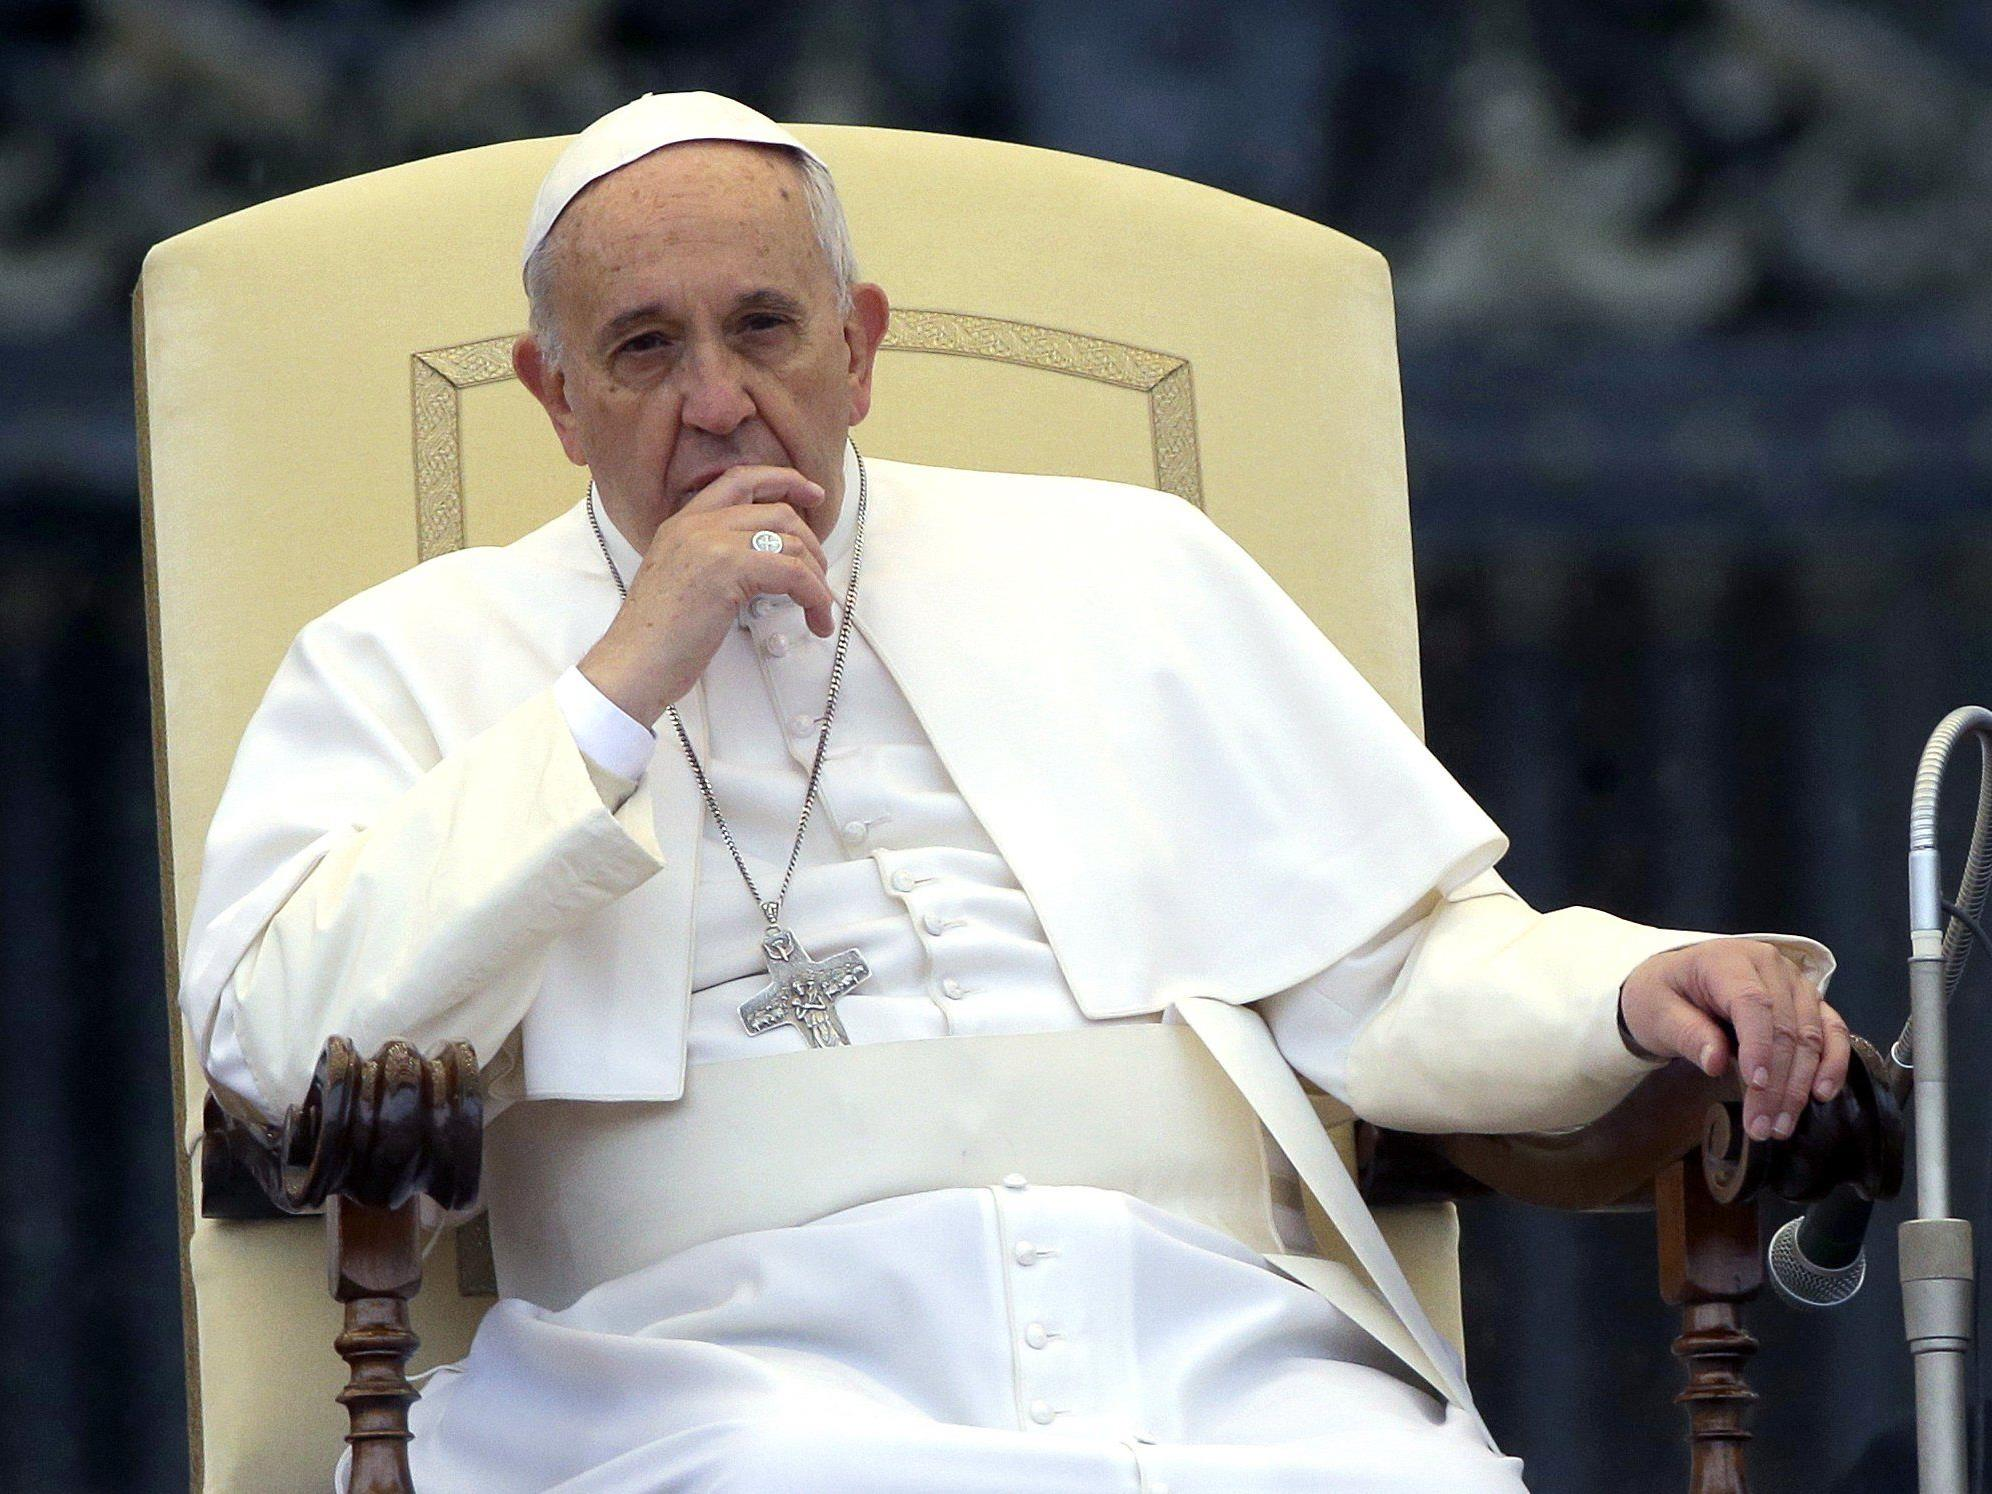 Papst Franziskus empfing Obdachlose im Vatikan.